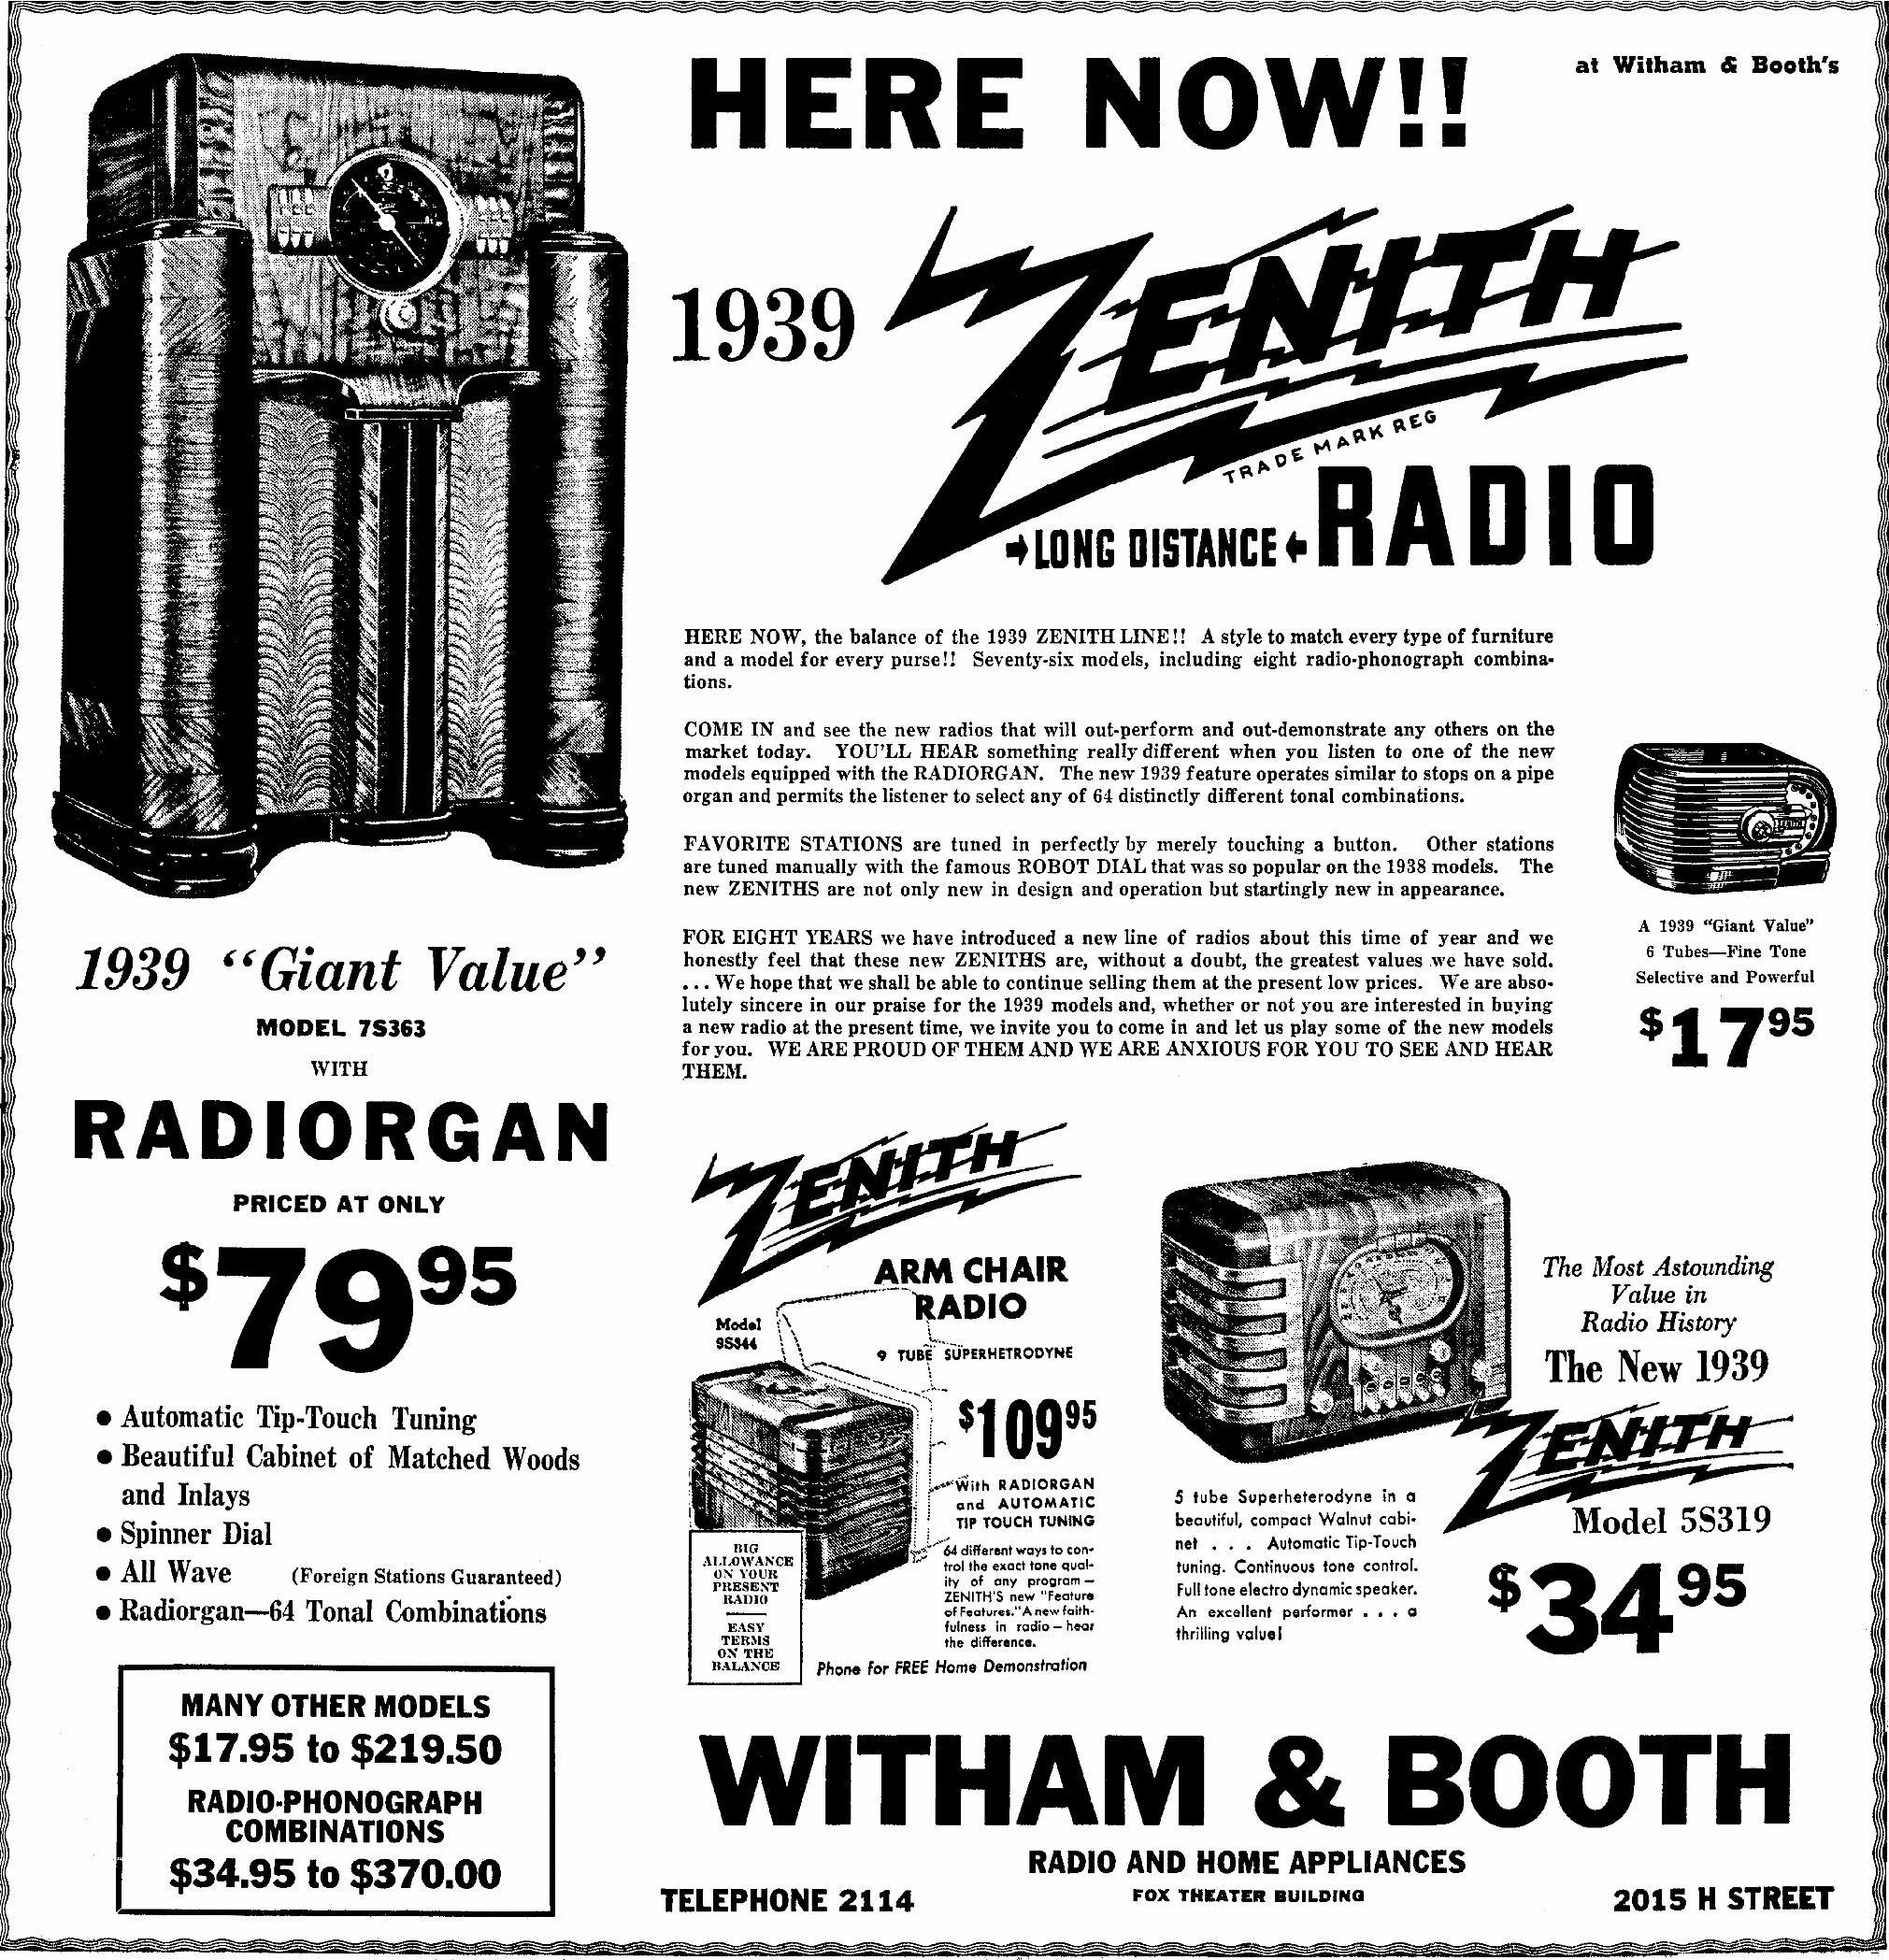 Zenith Model 7 S 363 Console Radio